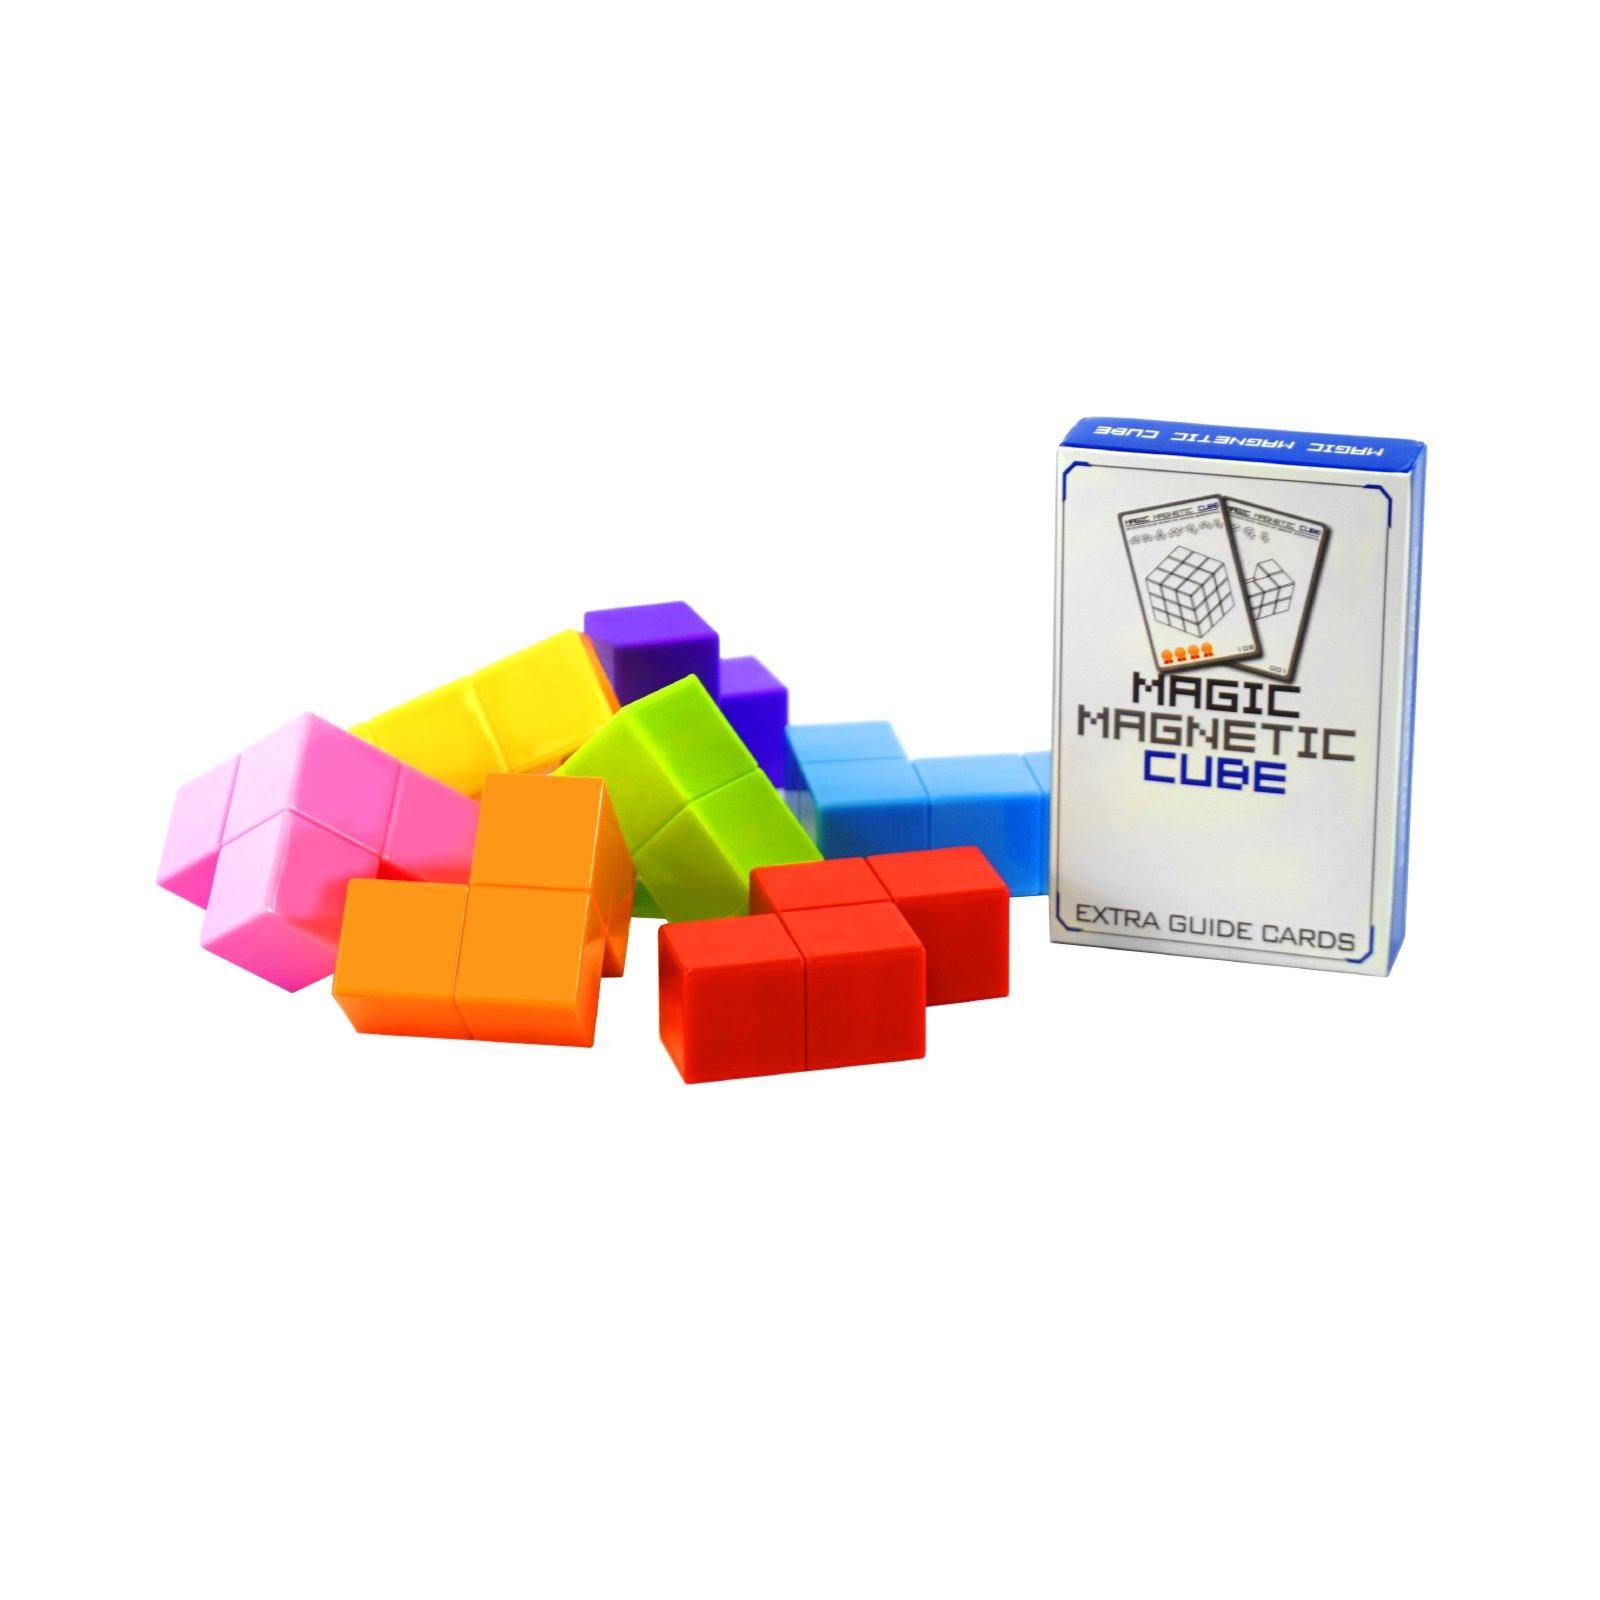 3D Cube Puzzle Game For Kids Brain Teaser Magnet Blocks 7 PCS Plus 54 Guide Cards